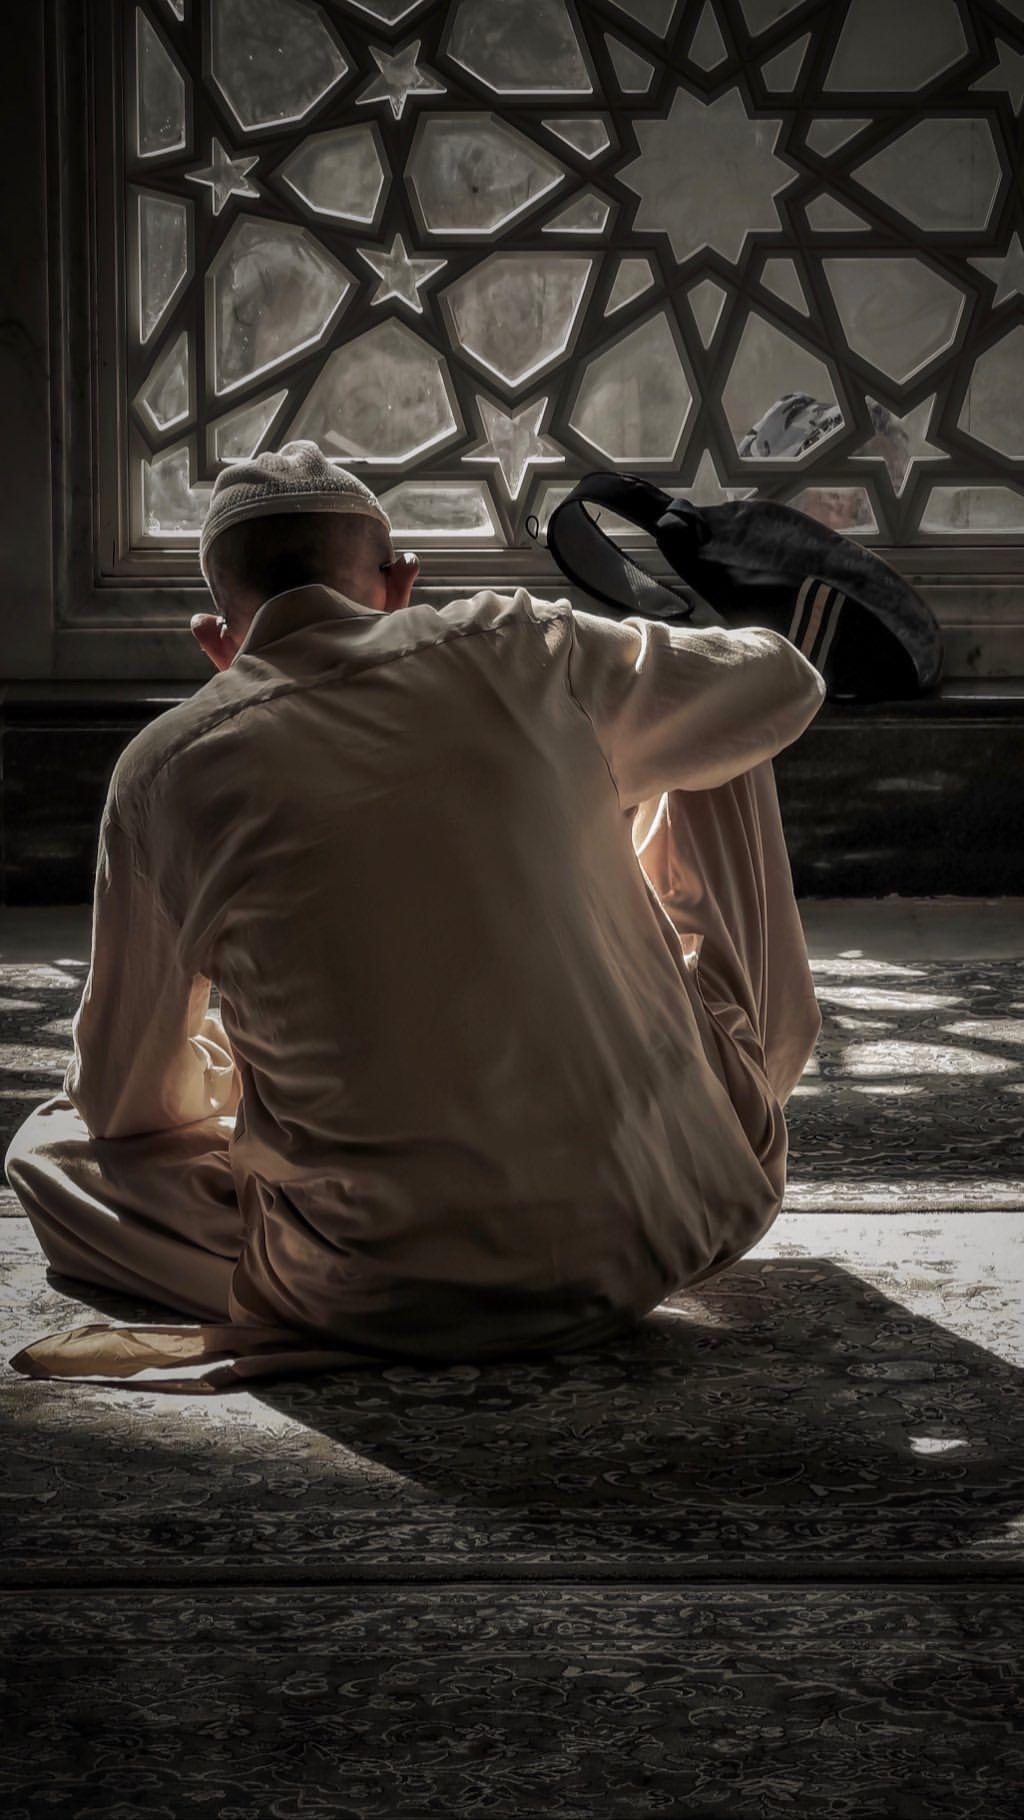 Muslim Panosundaki Pin